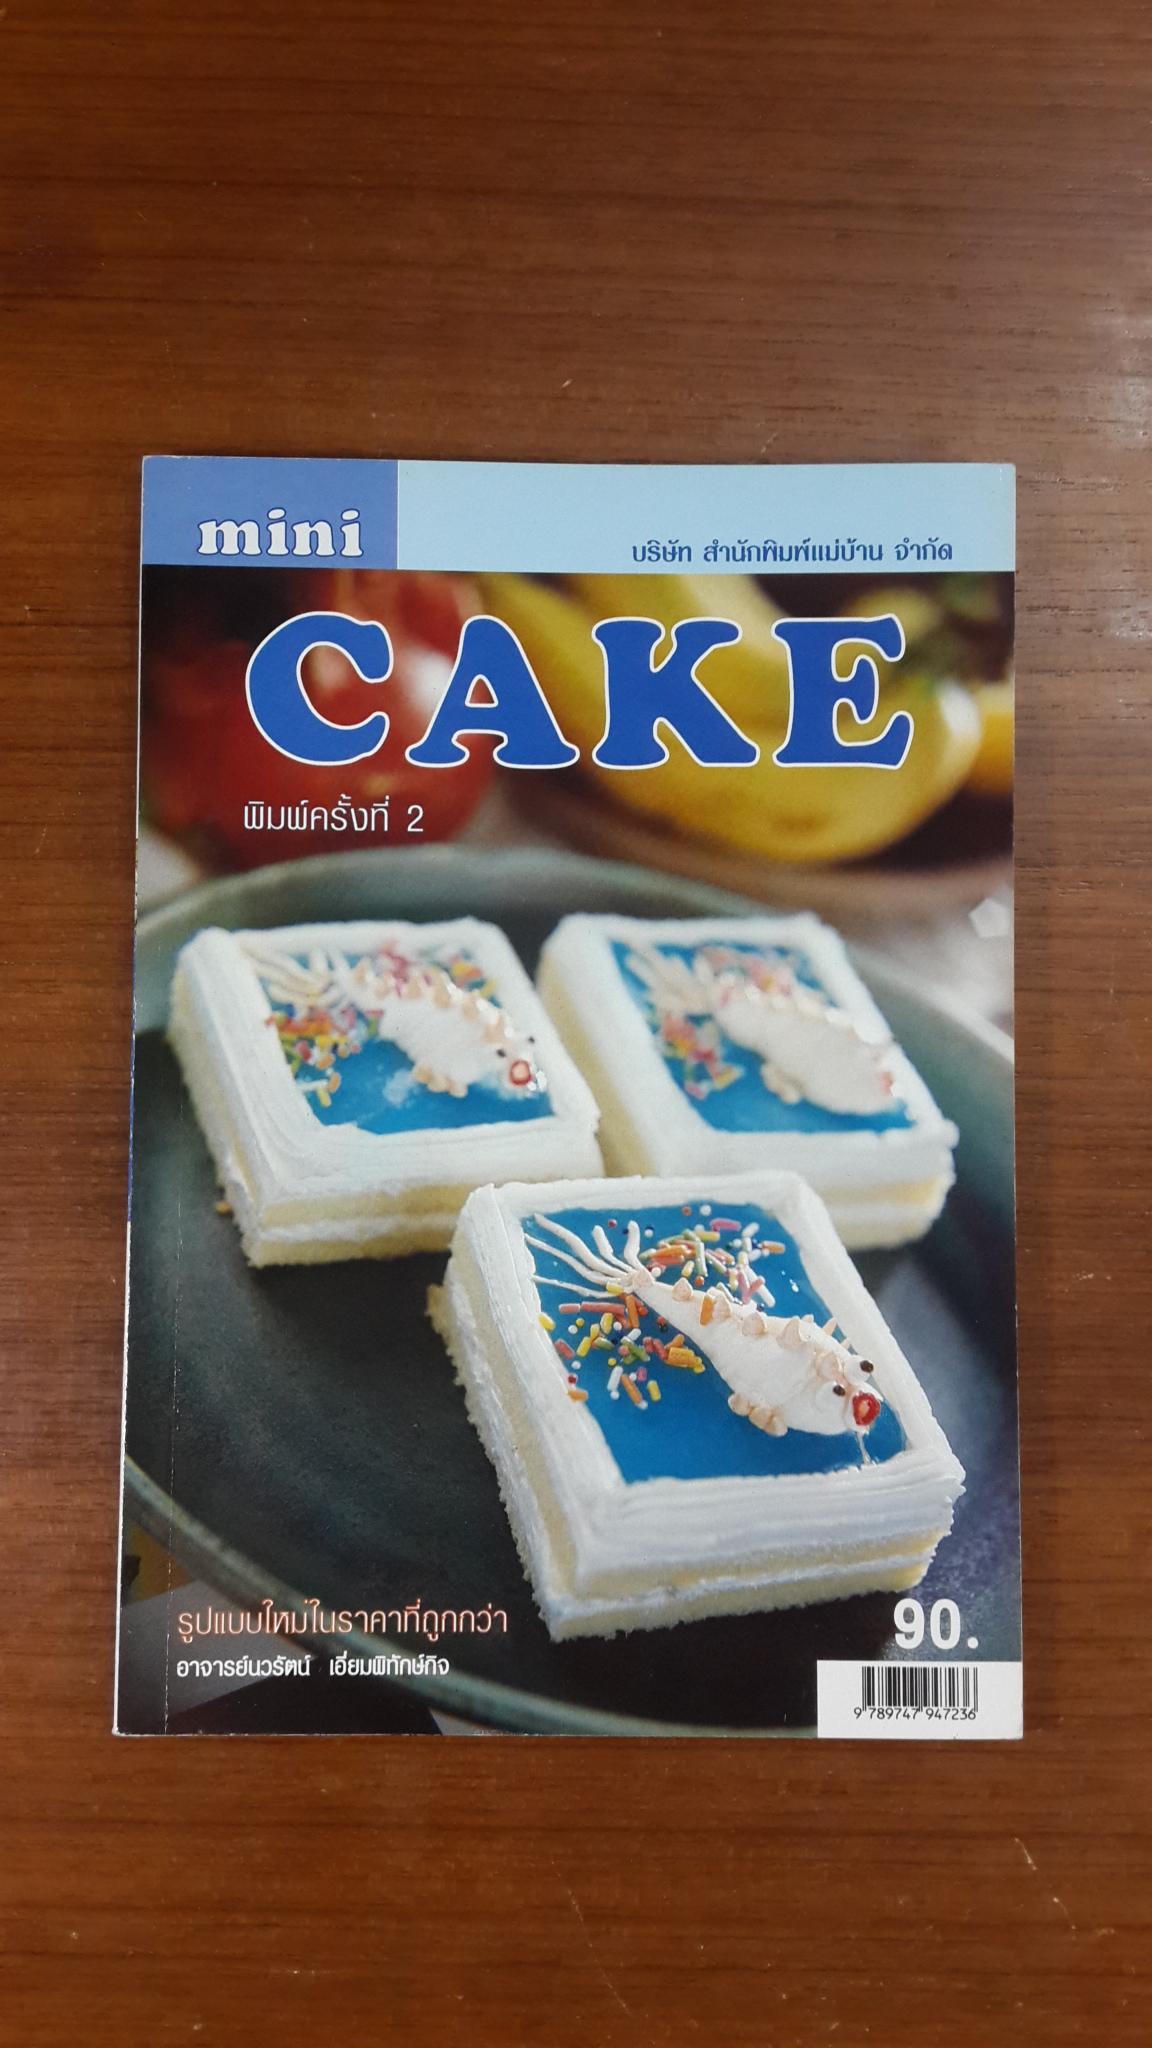 mimi CAKE / อาจารย์นวรัตน์ เอี่ยมพิทักษ์กิจ